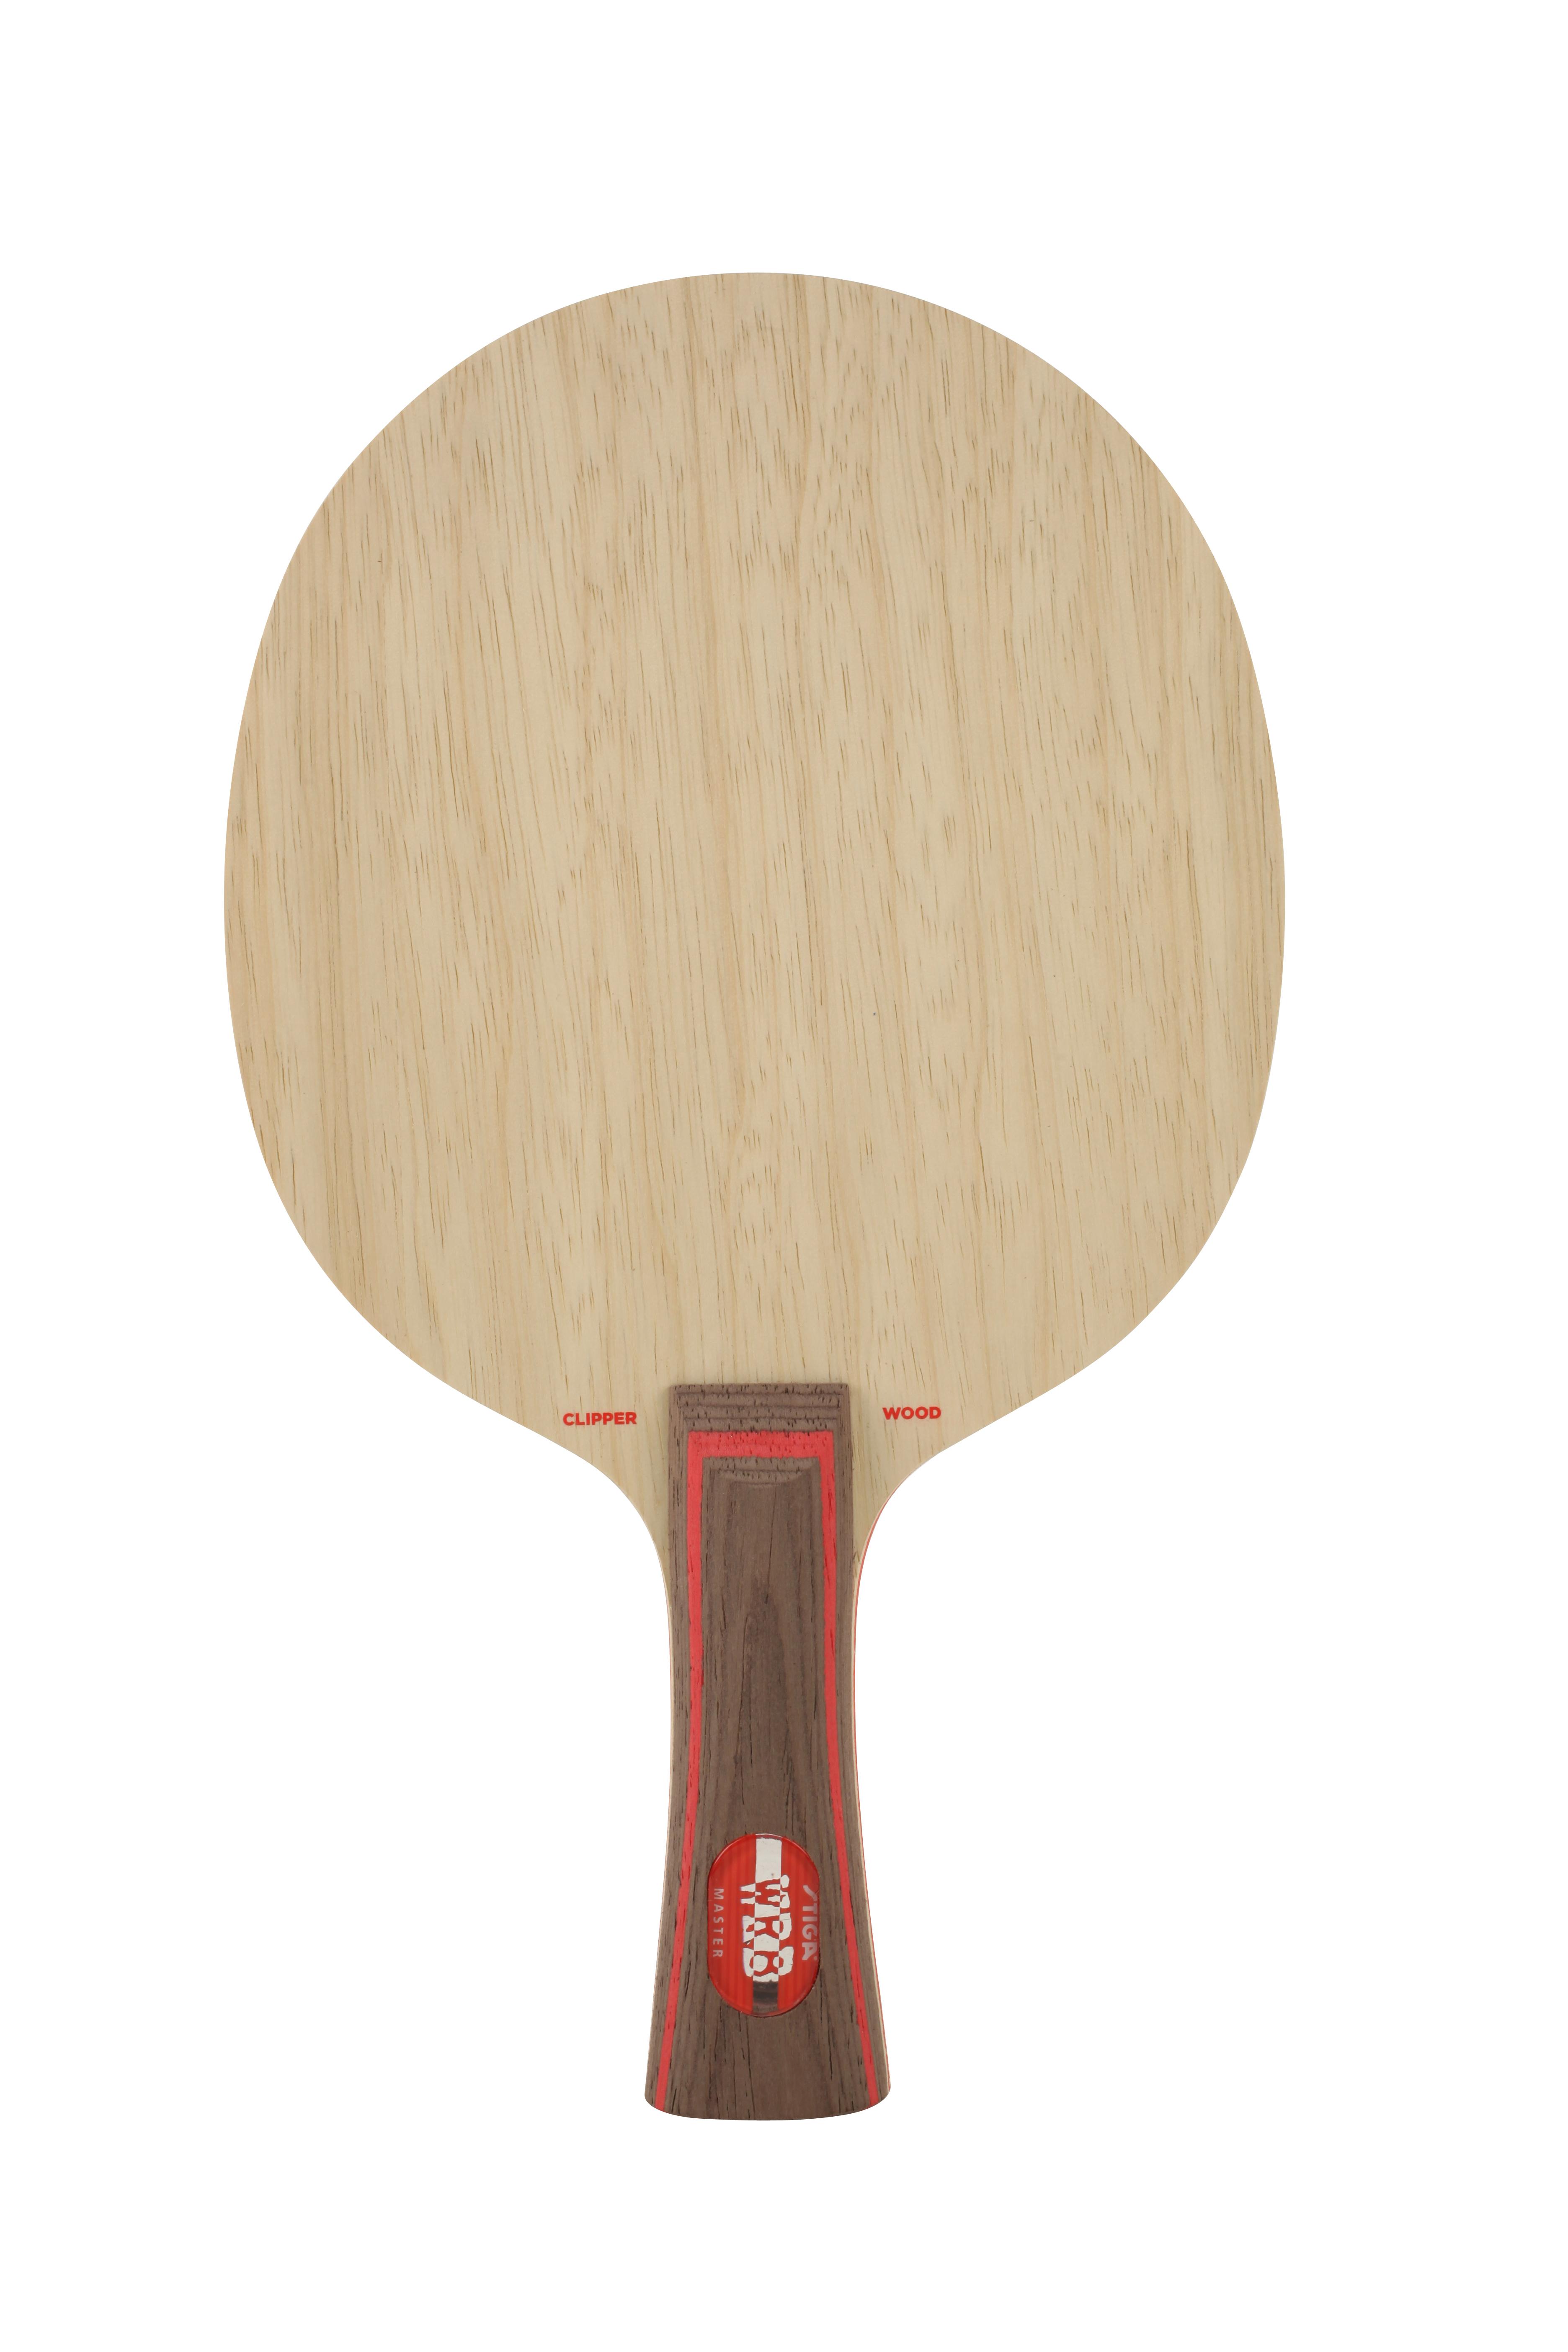 stiga-clipper-wood-wrb-tischtennis-holz